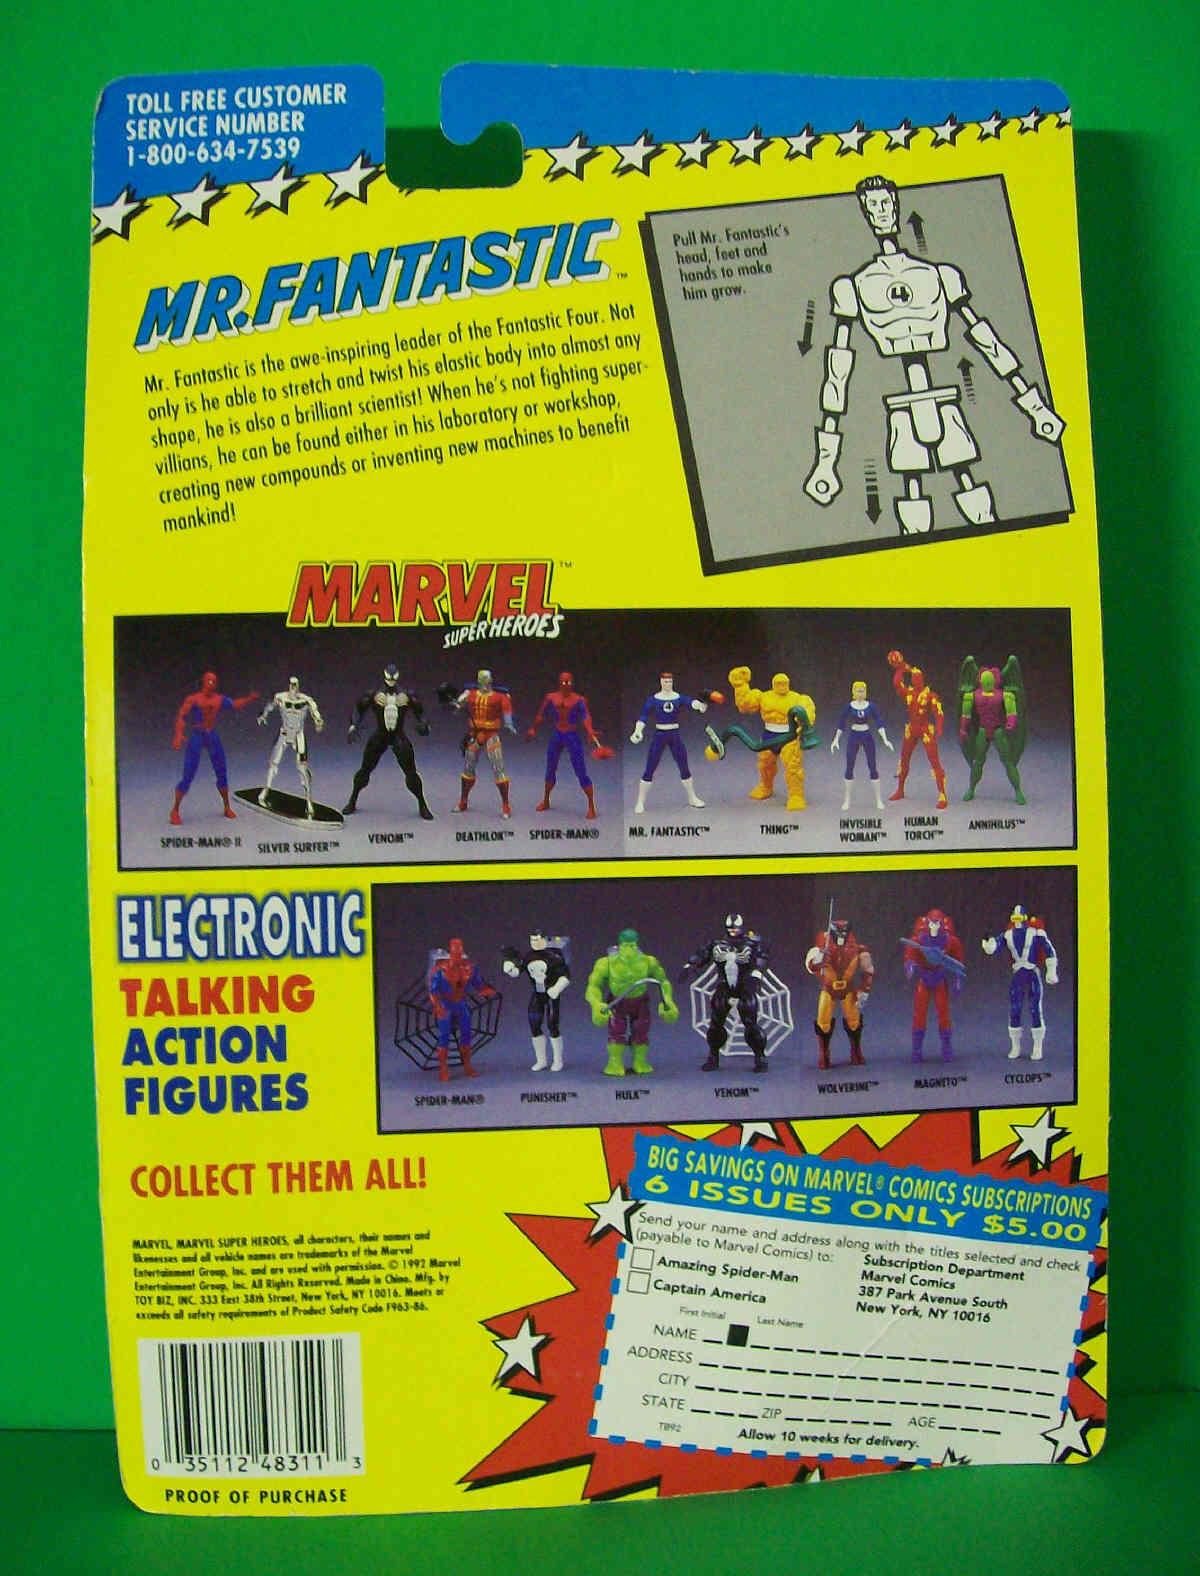 Mr. Fantastic Marvel Superheroes Fantastic Four - 1992